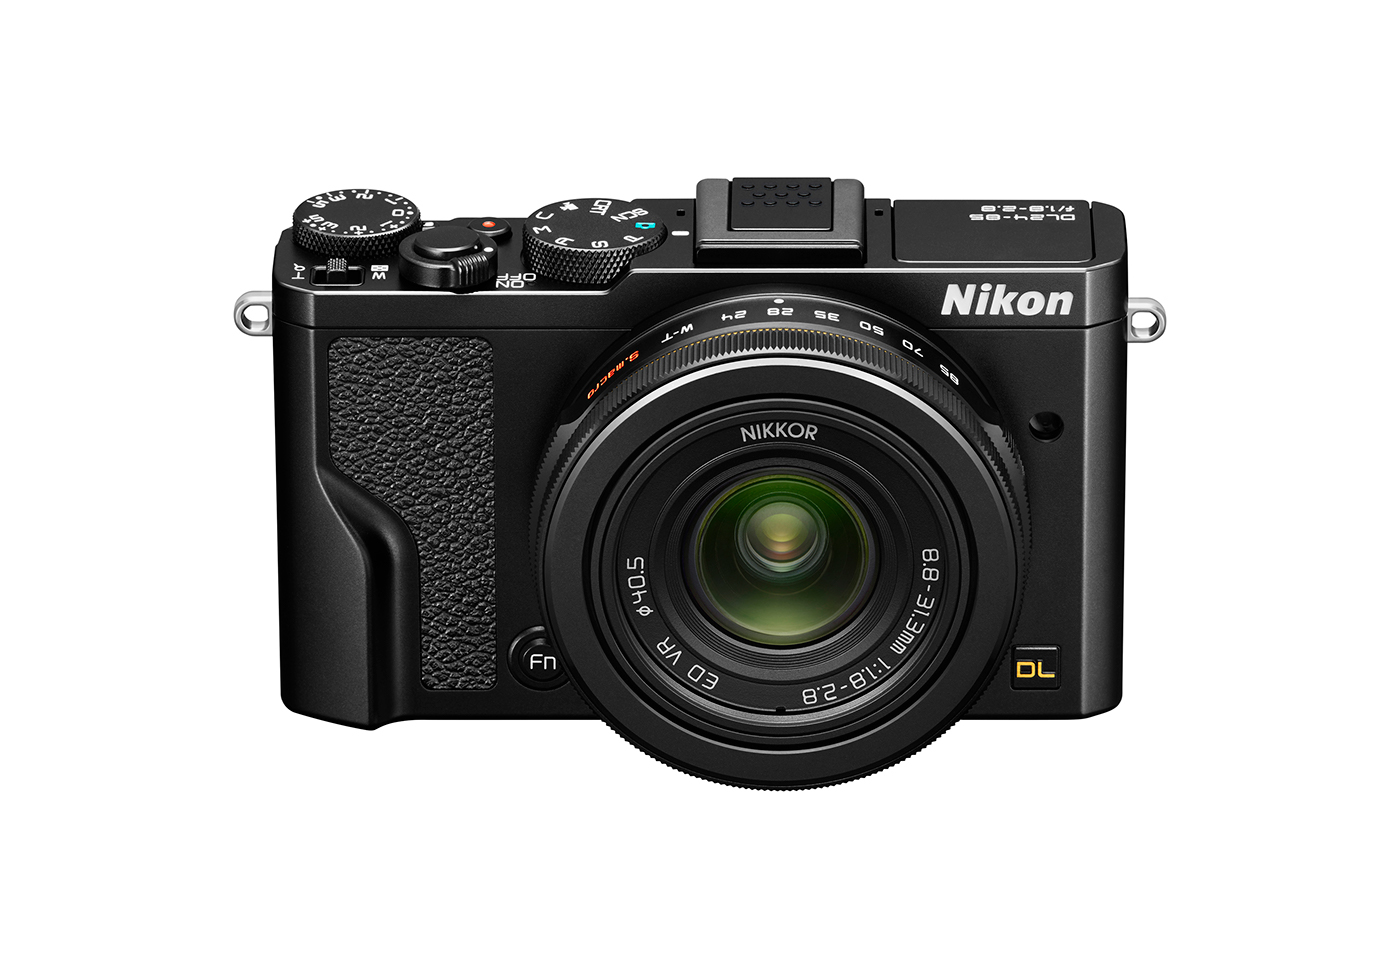 Nikon DL on